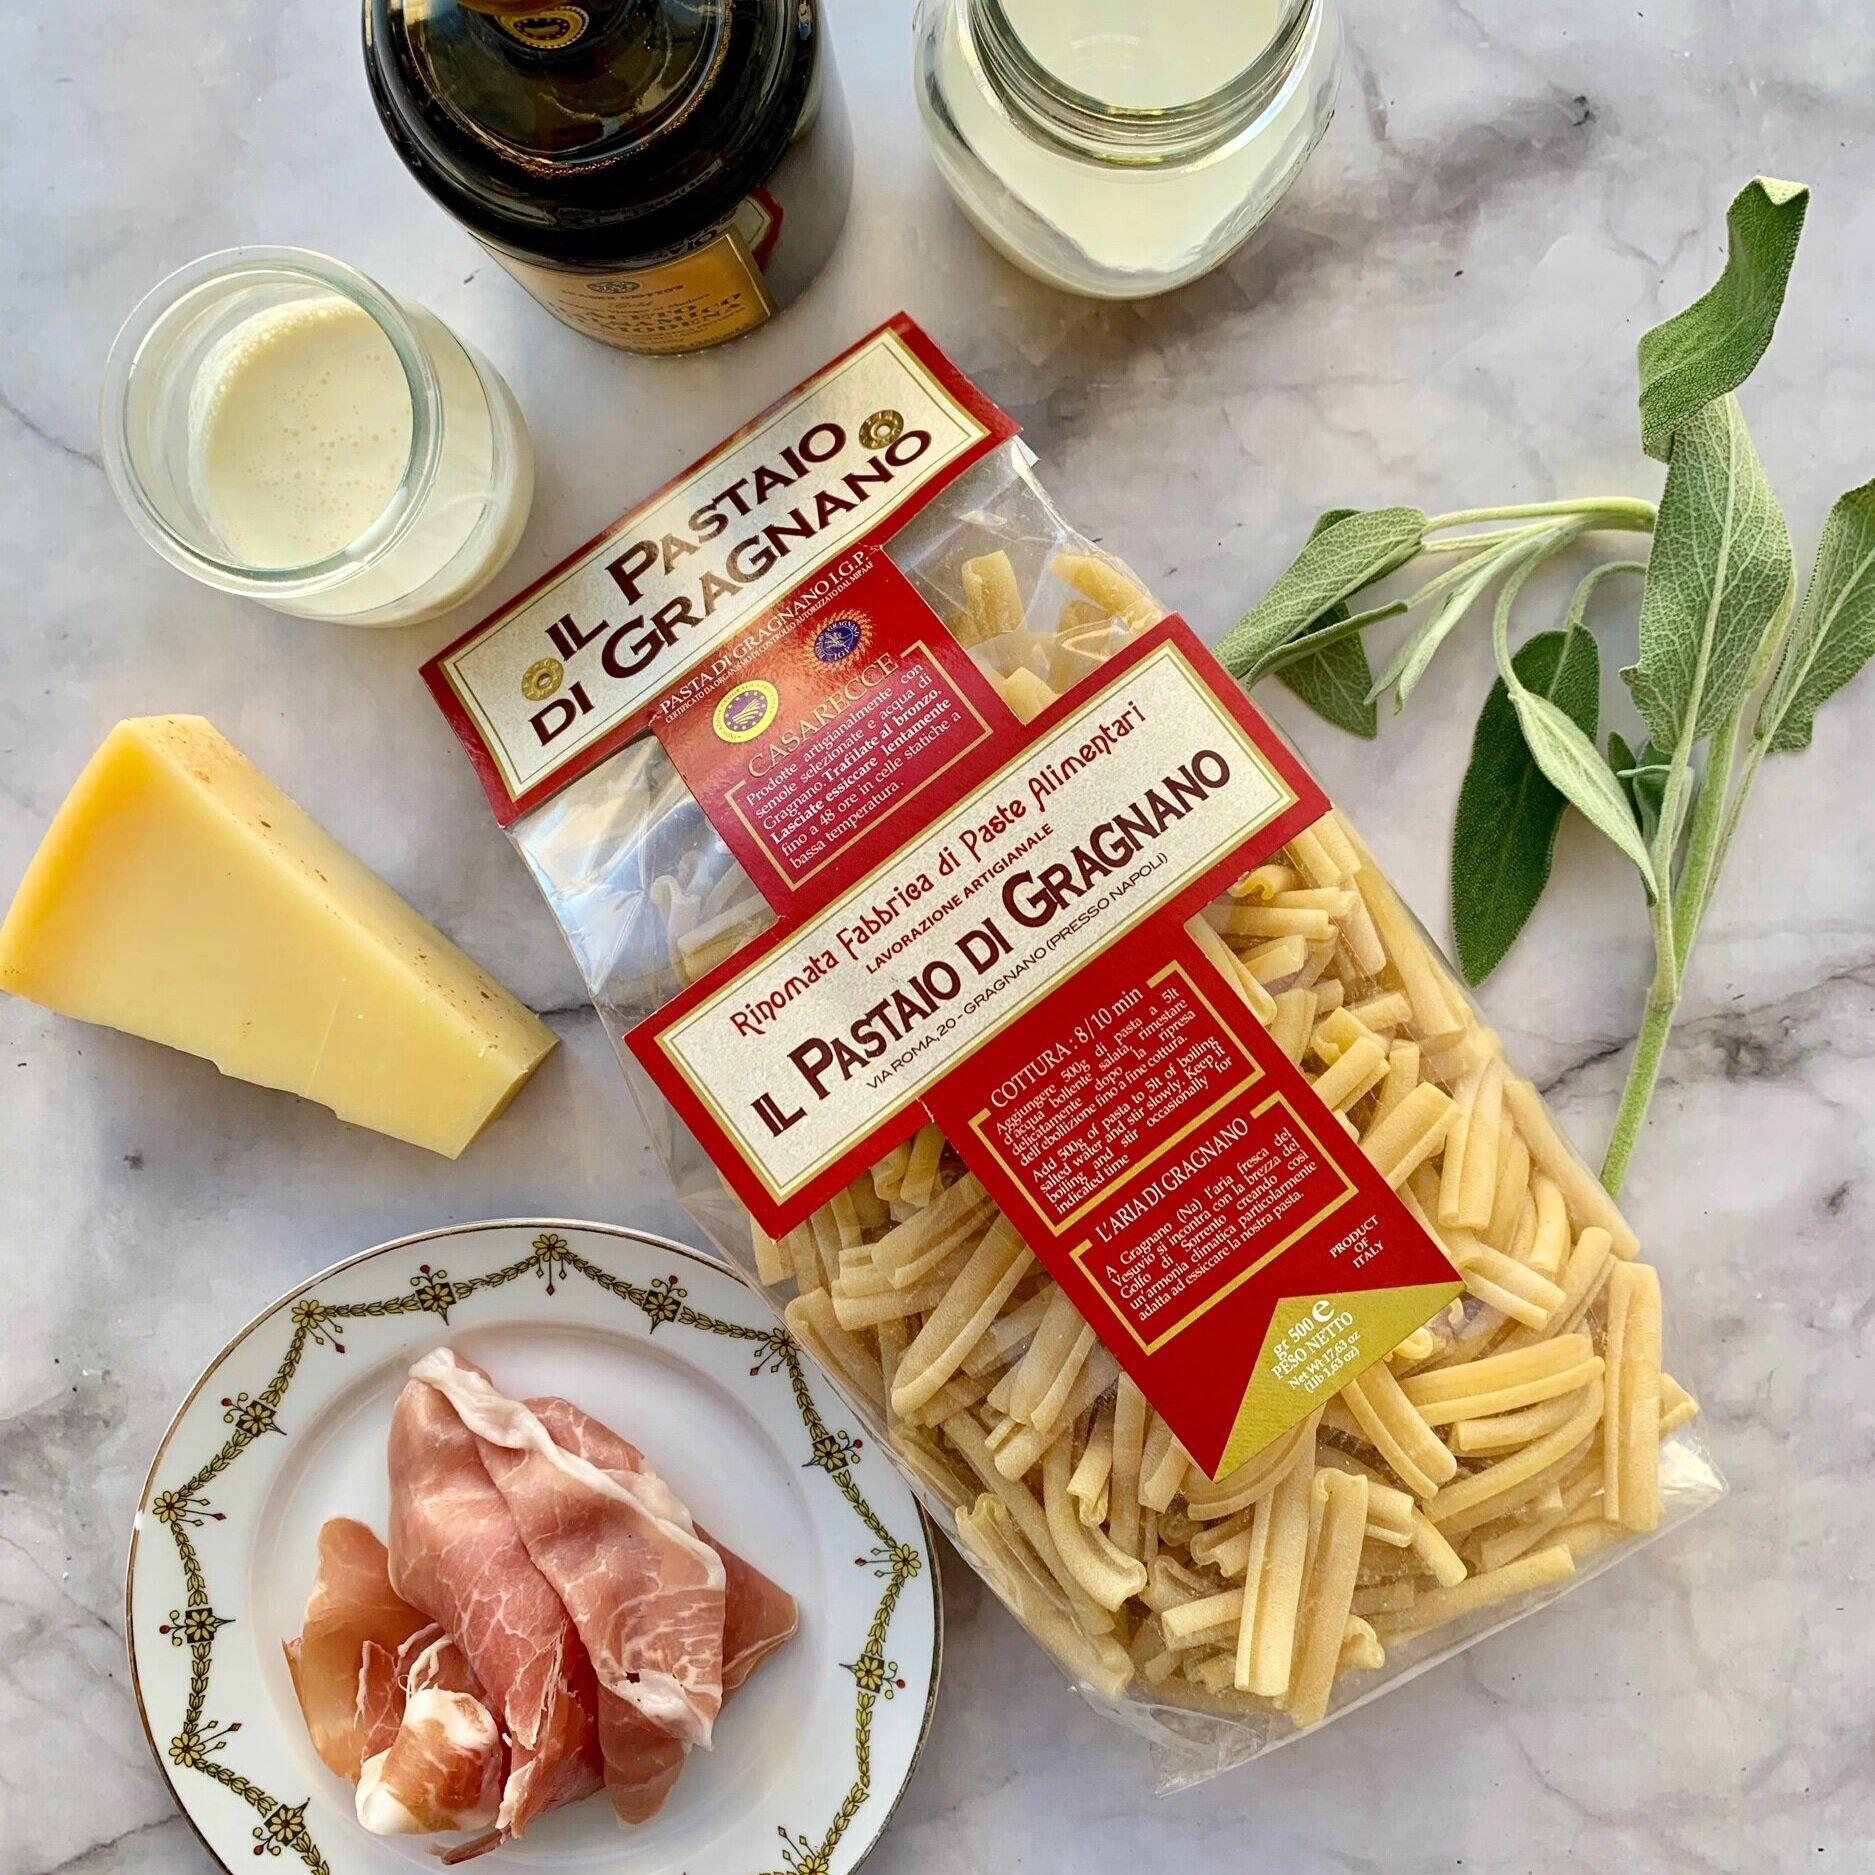 Ingredients for Casarecce alla Emilia-Romagna